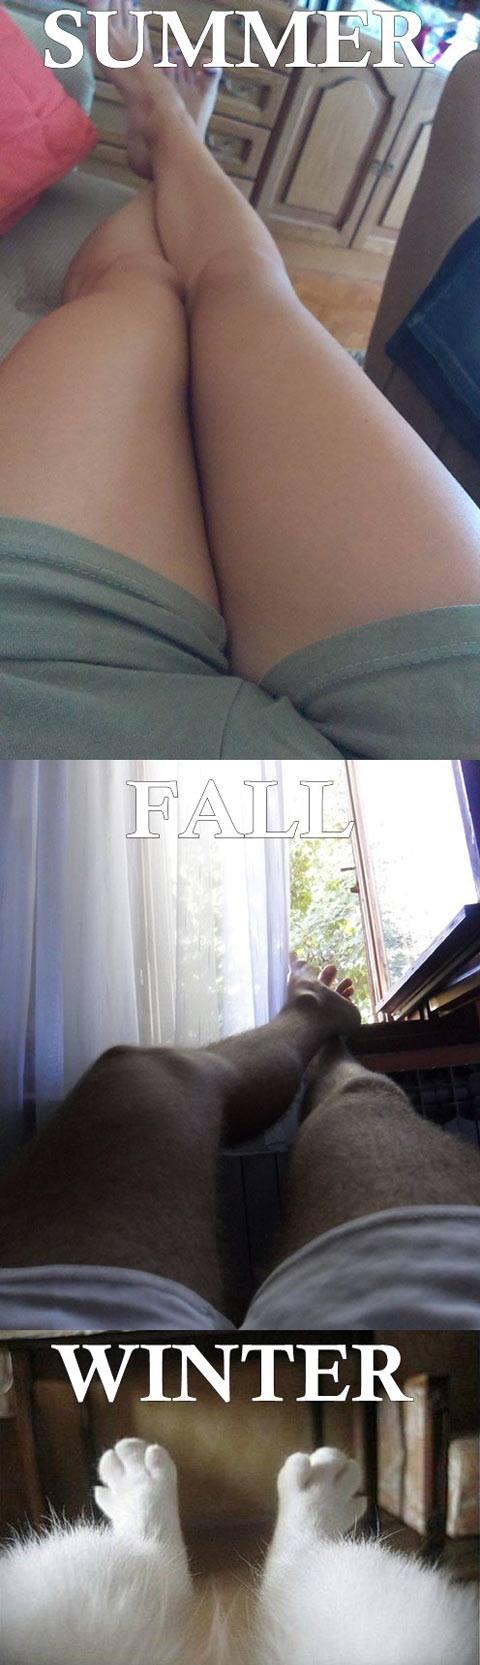 Shaved Legs Humor ...LOL...